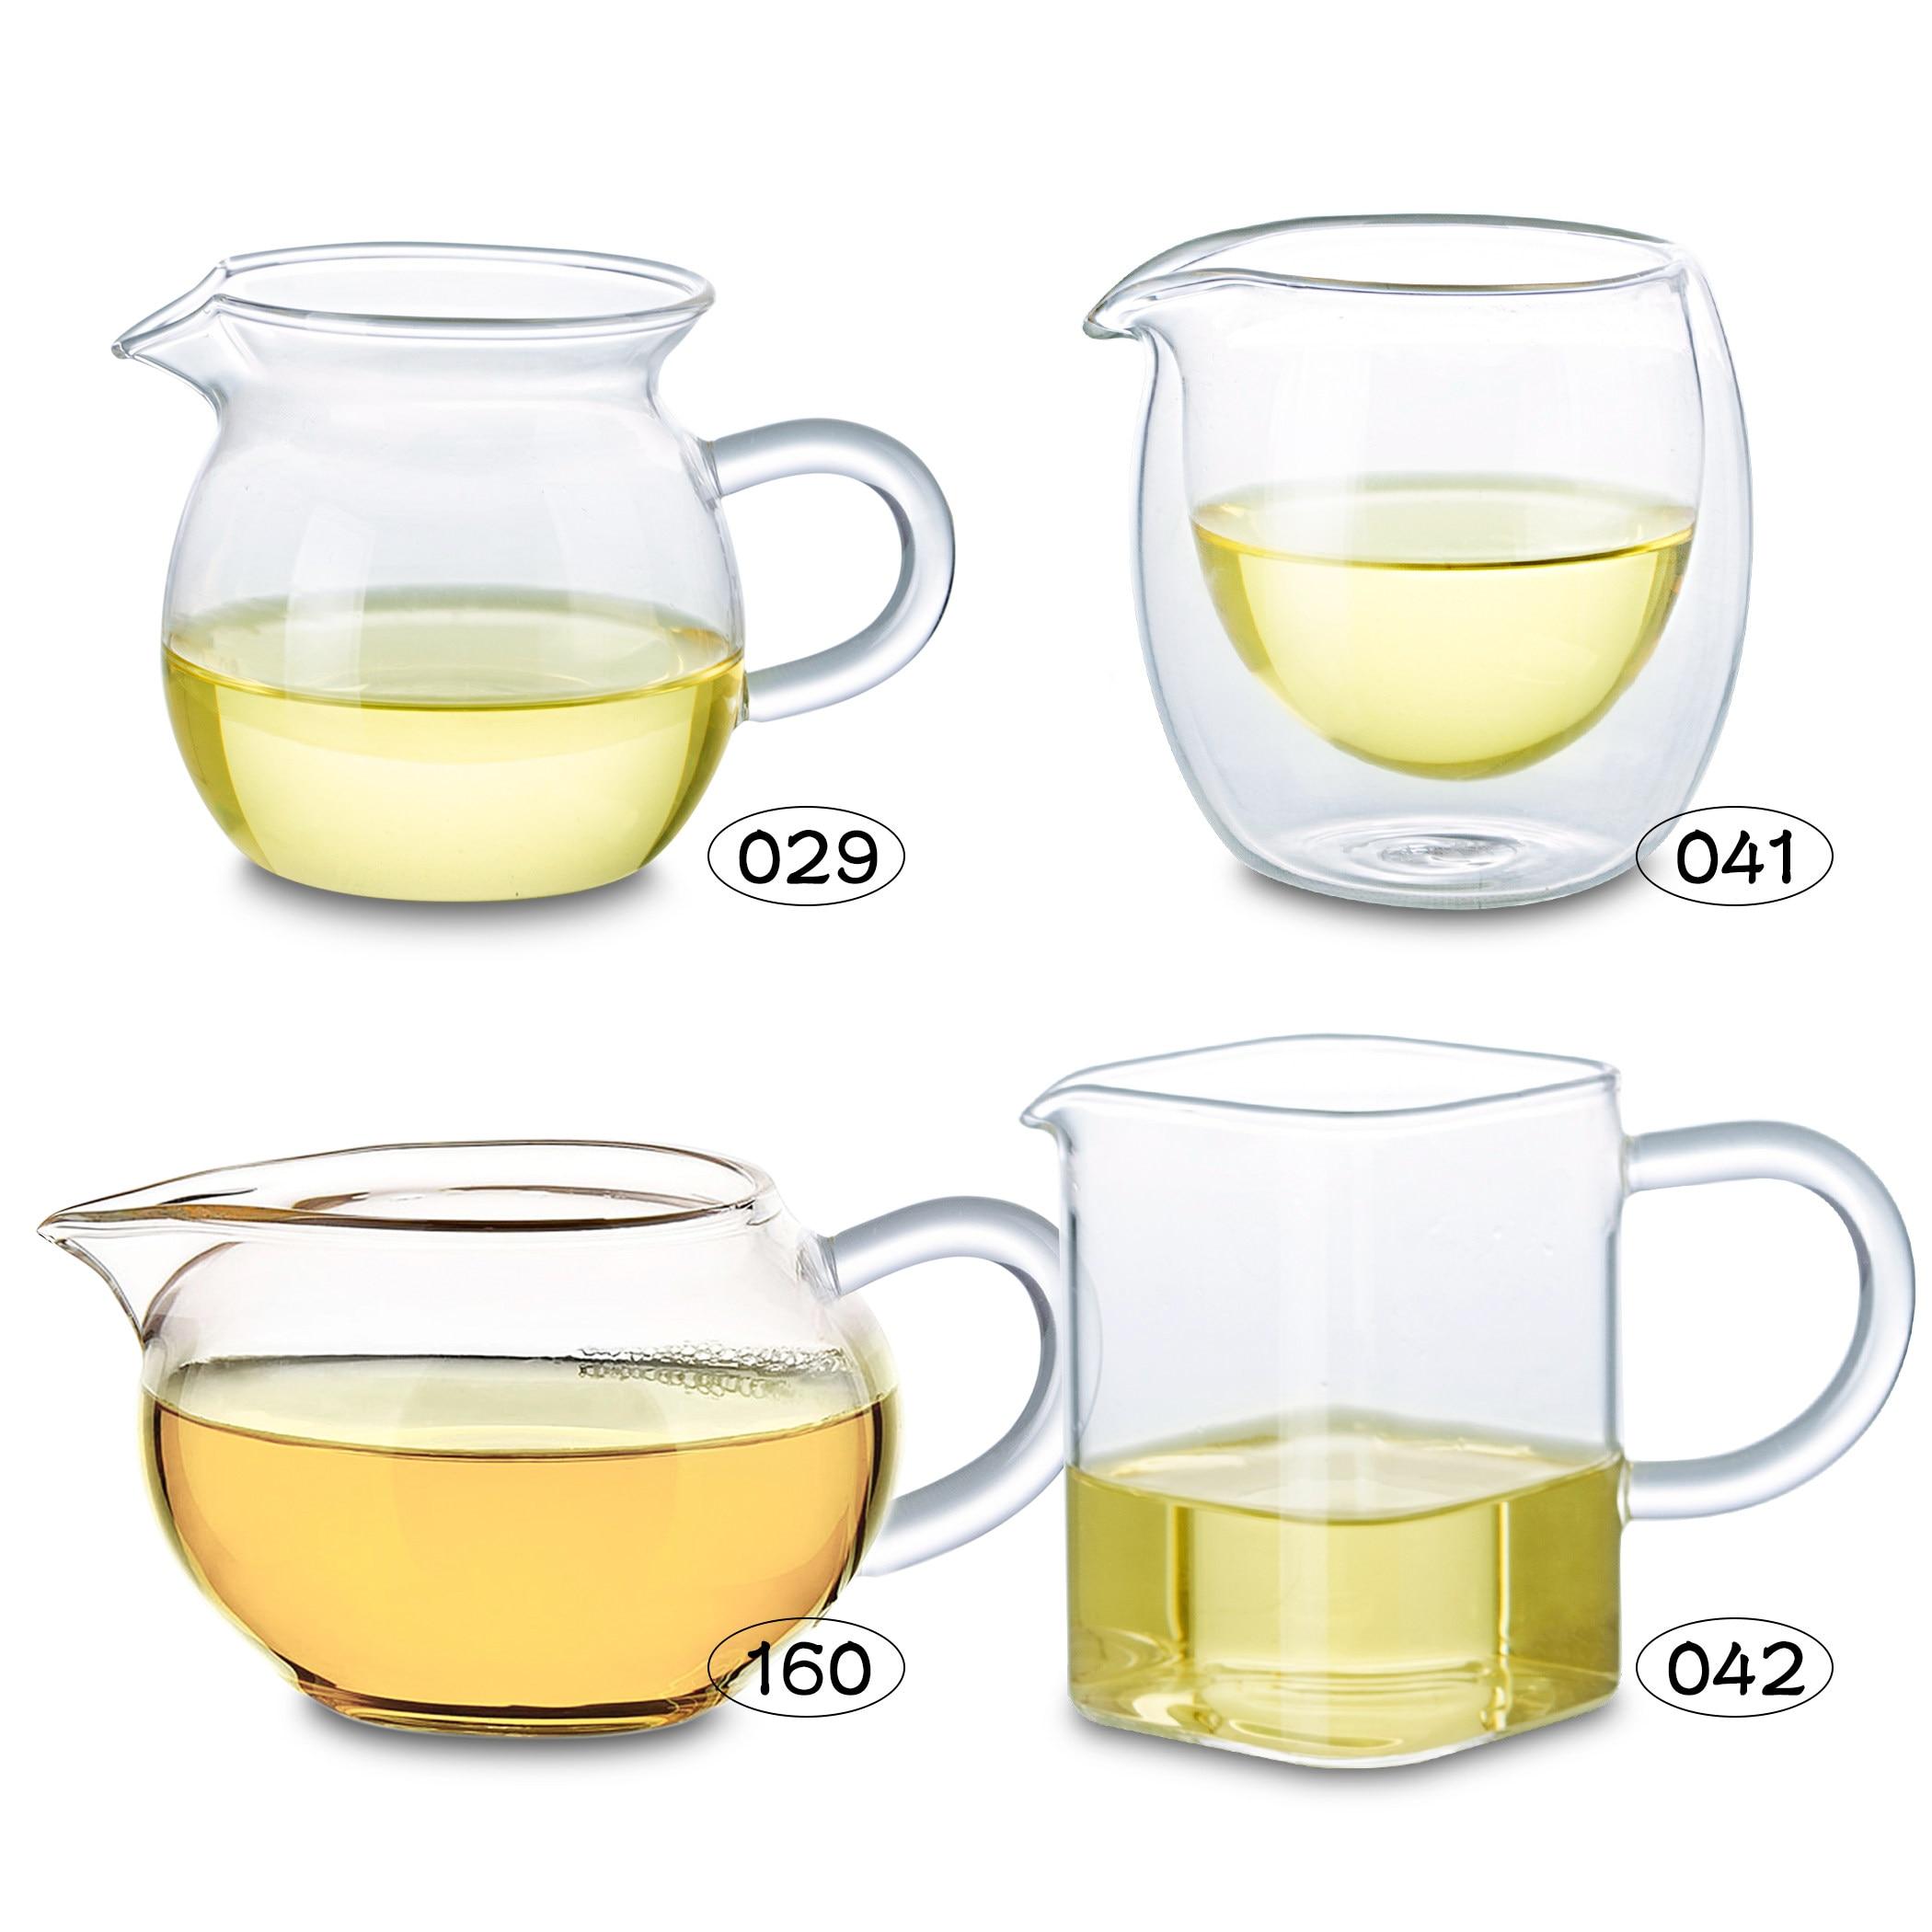 Soorten Hittebestendige Clear Glas Tea Serving Pitcher Chinese Gong Fu Cha Hai